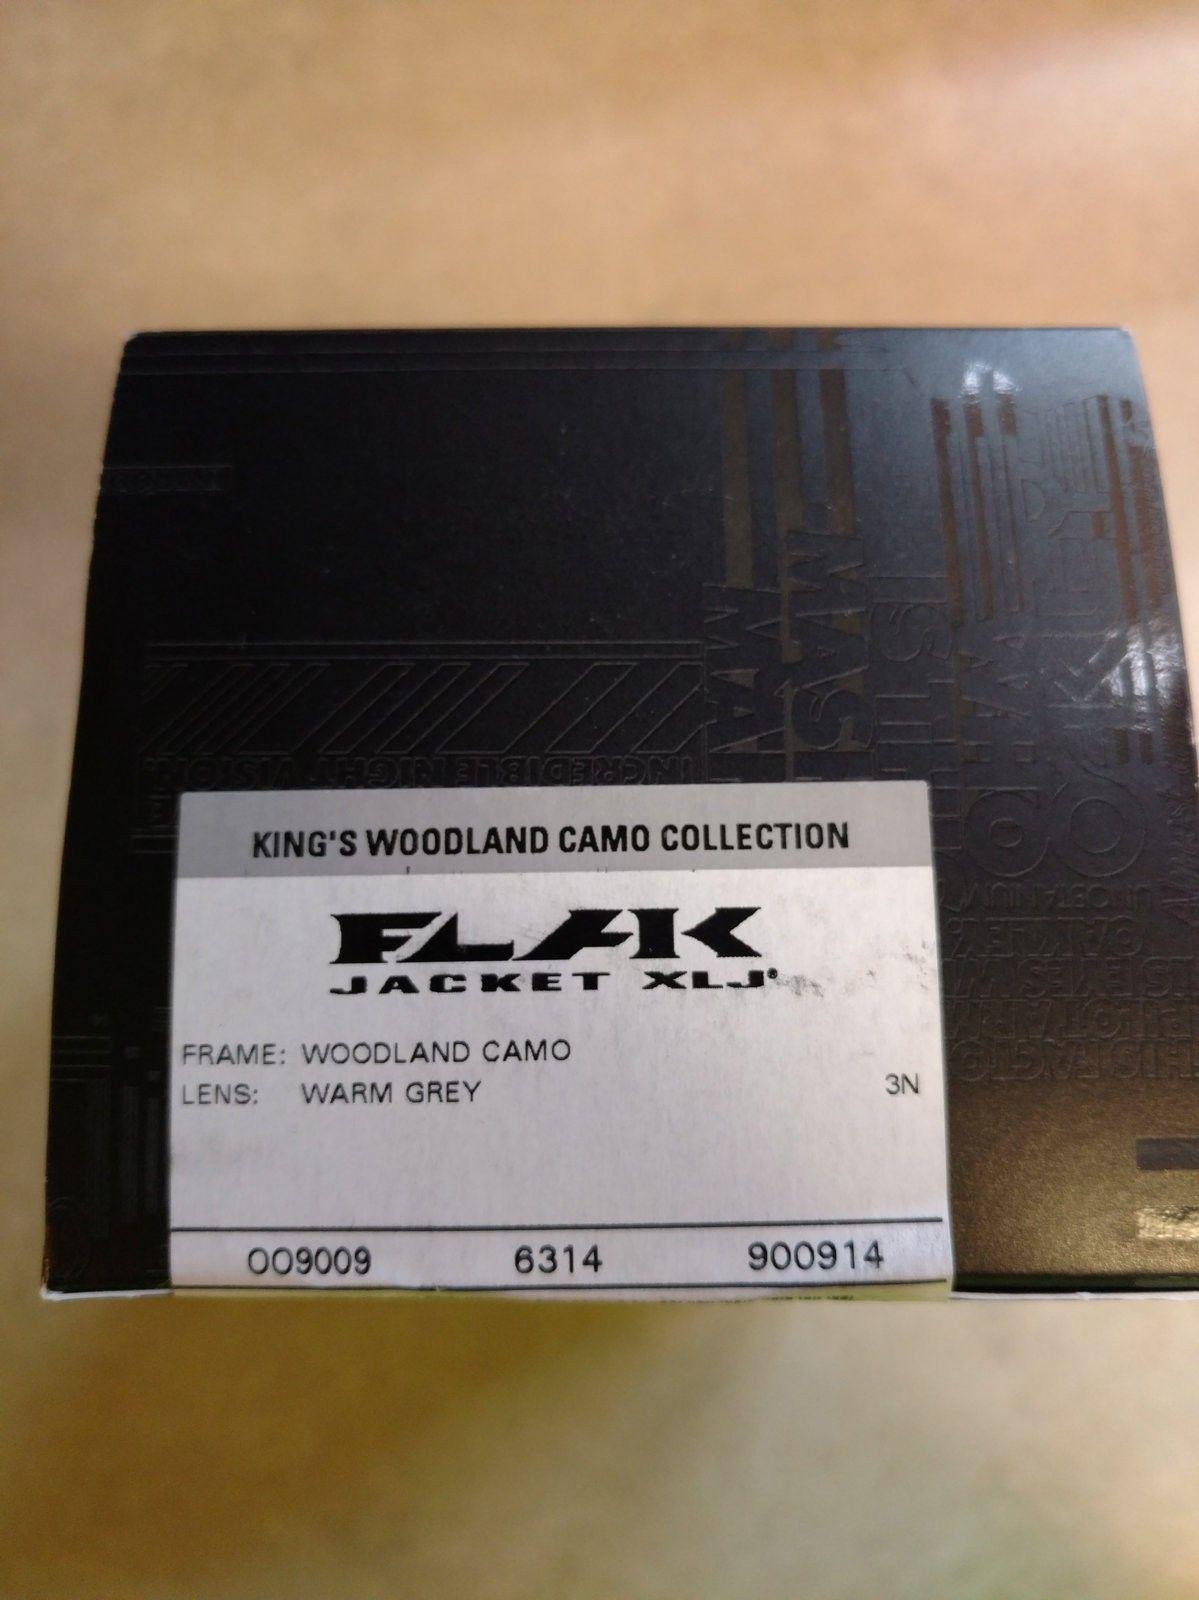 Woodland Camo Flak Jacket 1.0 LNIB - 2016-04-11 16.53.17.jpg